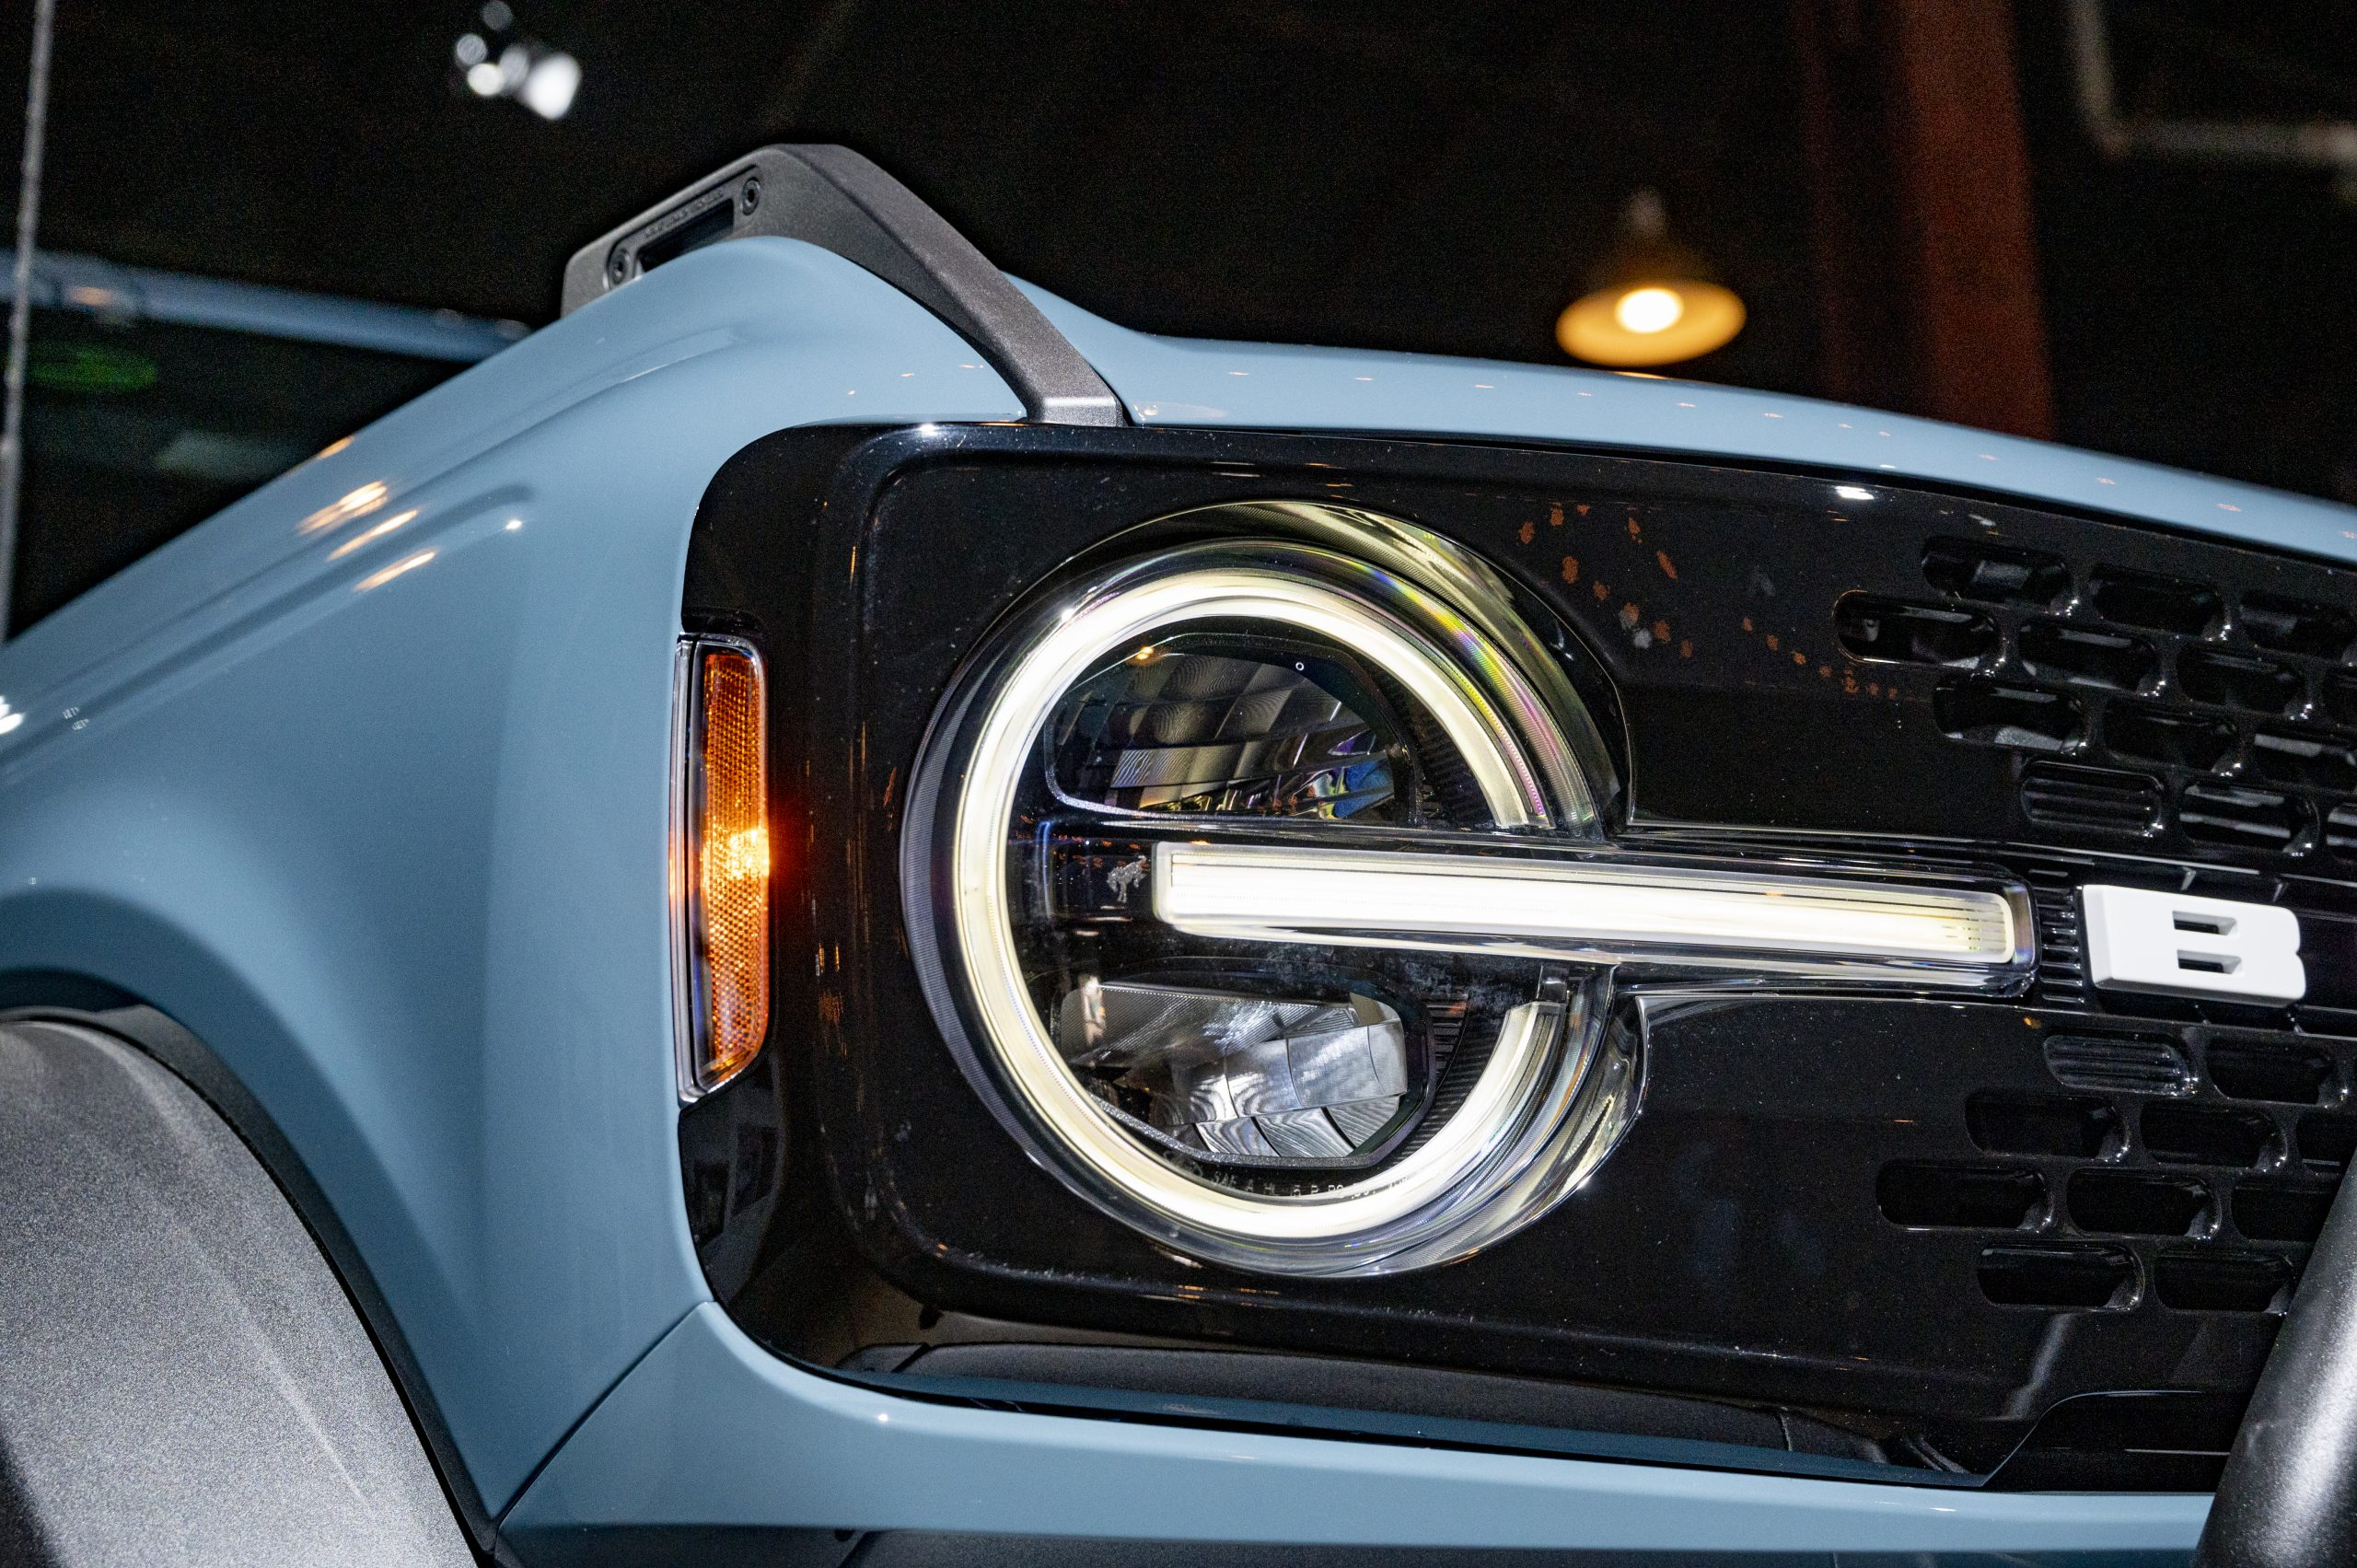 2021 Ford Bronco headlight closeup